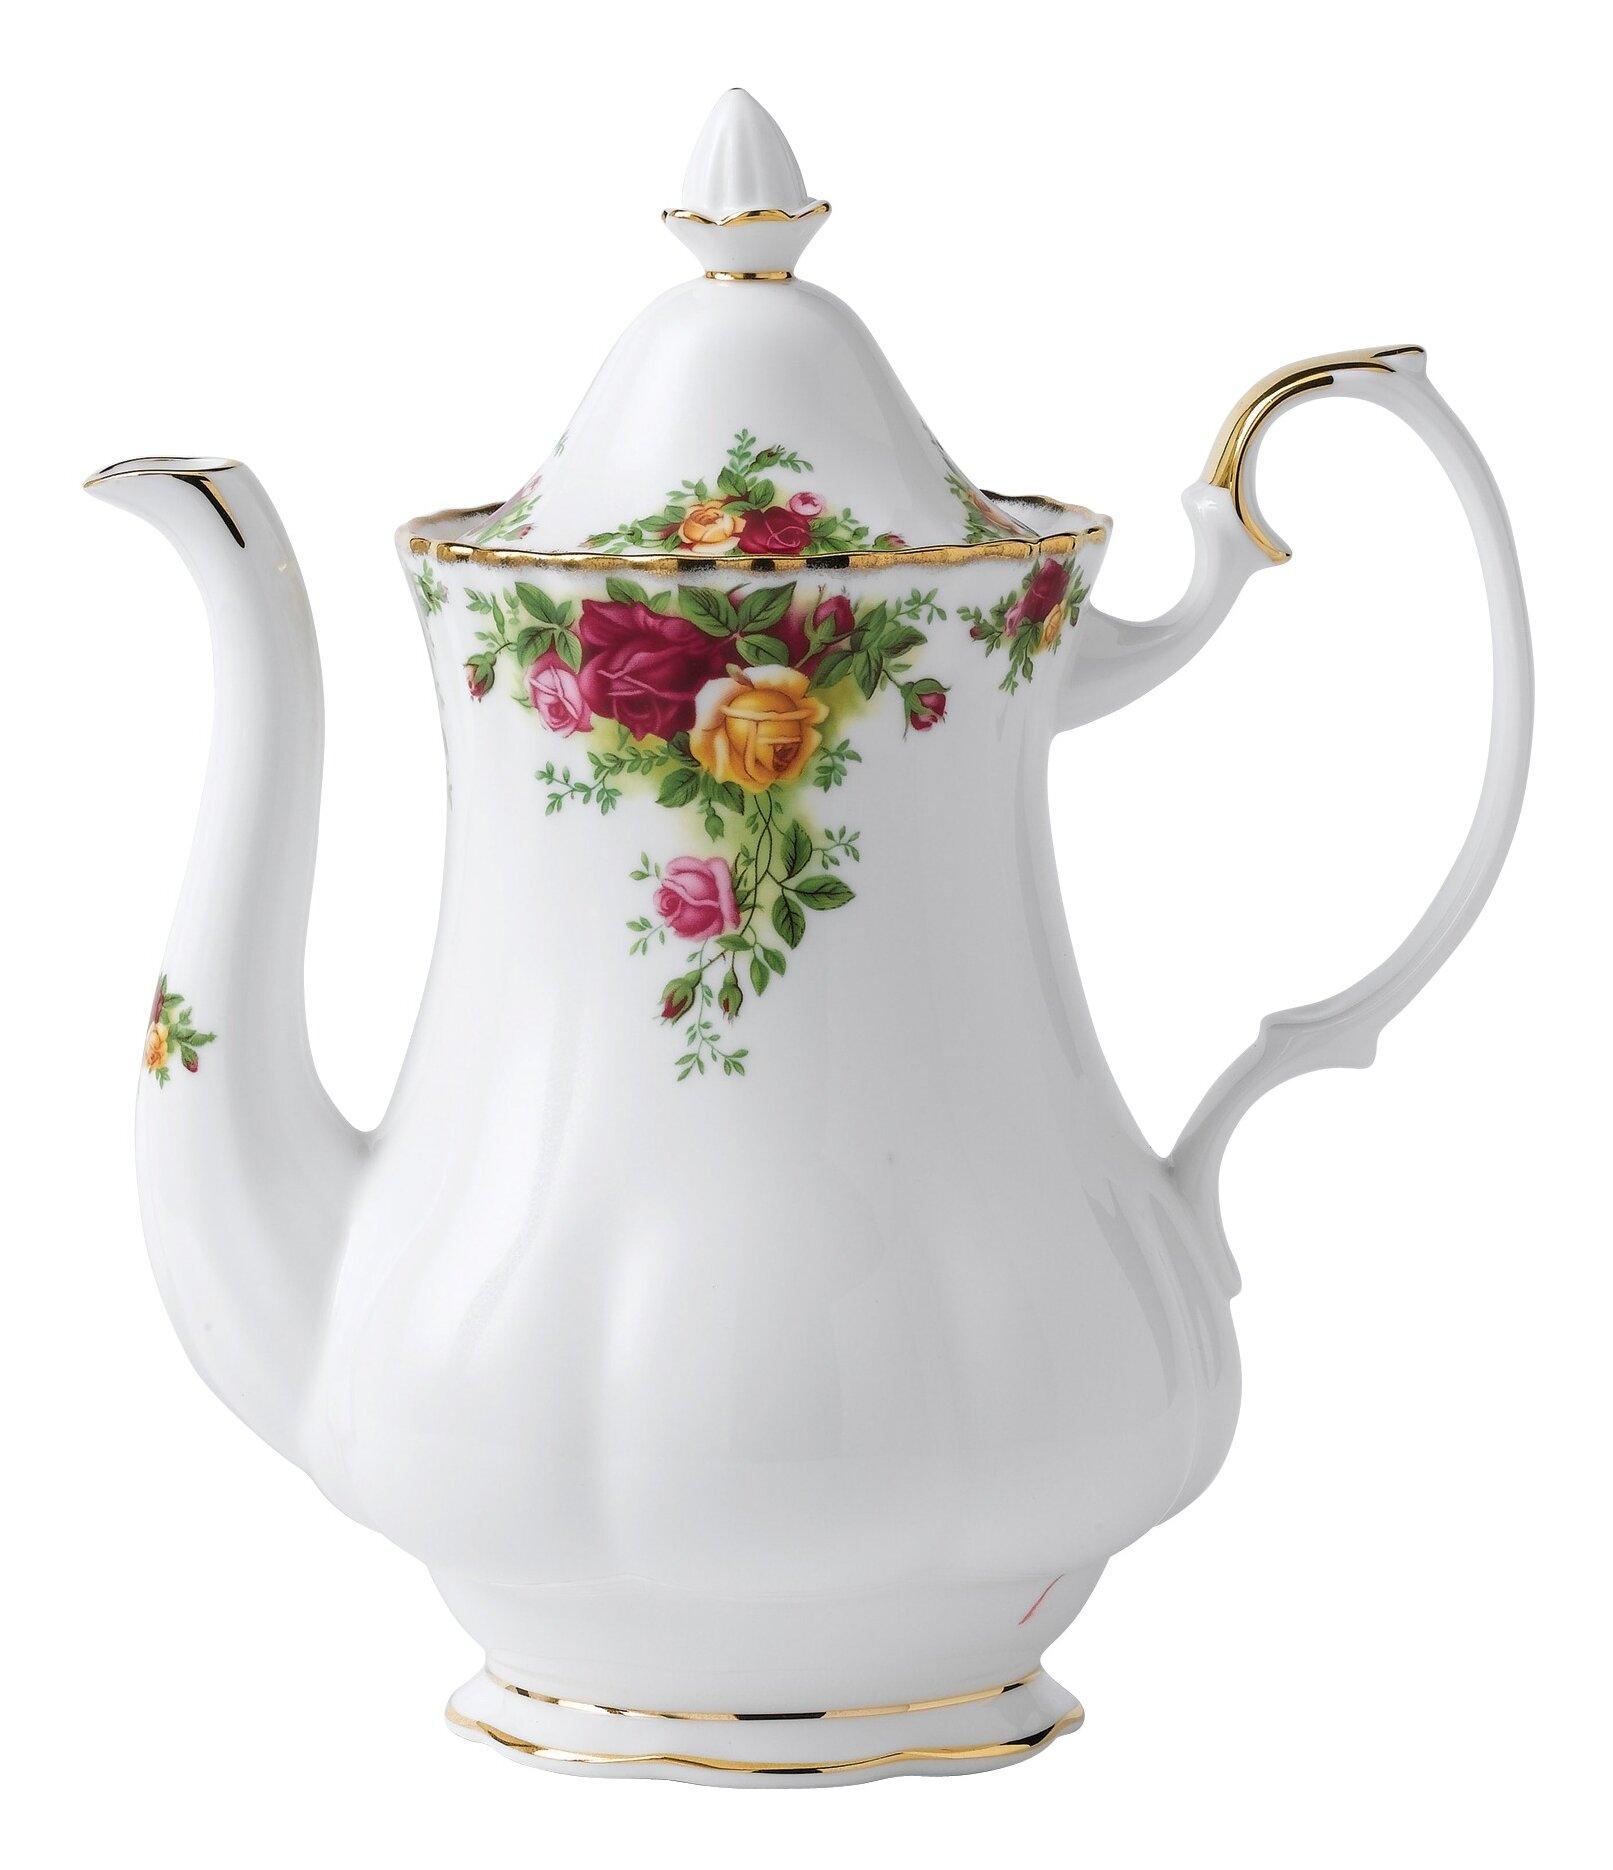 Royal Albert Old Country Roses 5 25 Cup Coffee Pot Server Reviews Wayfair